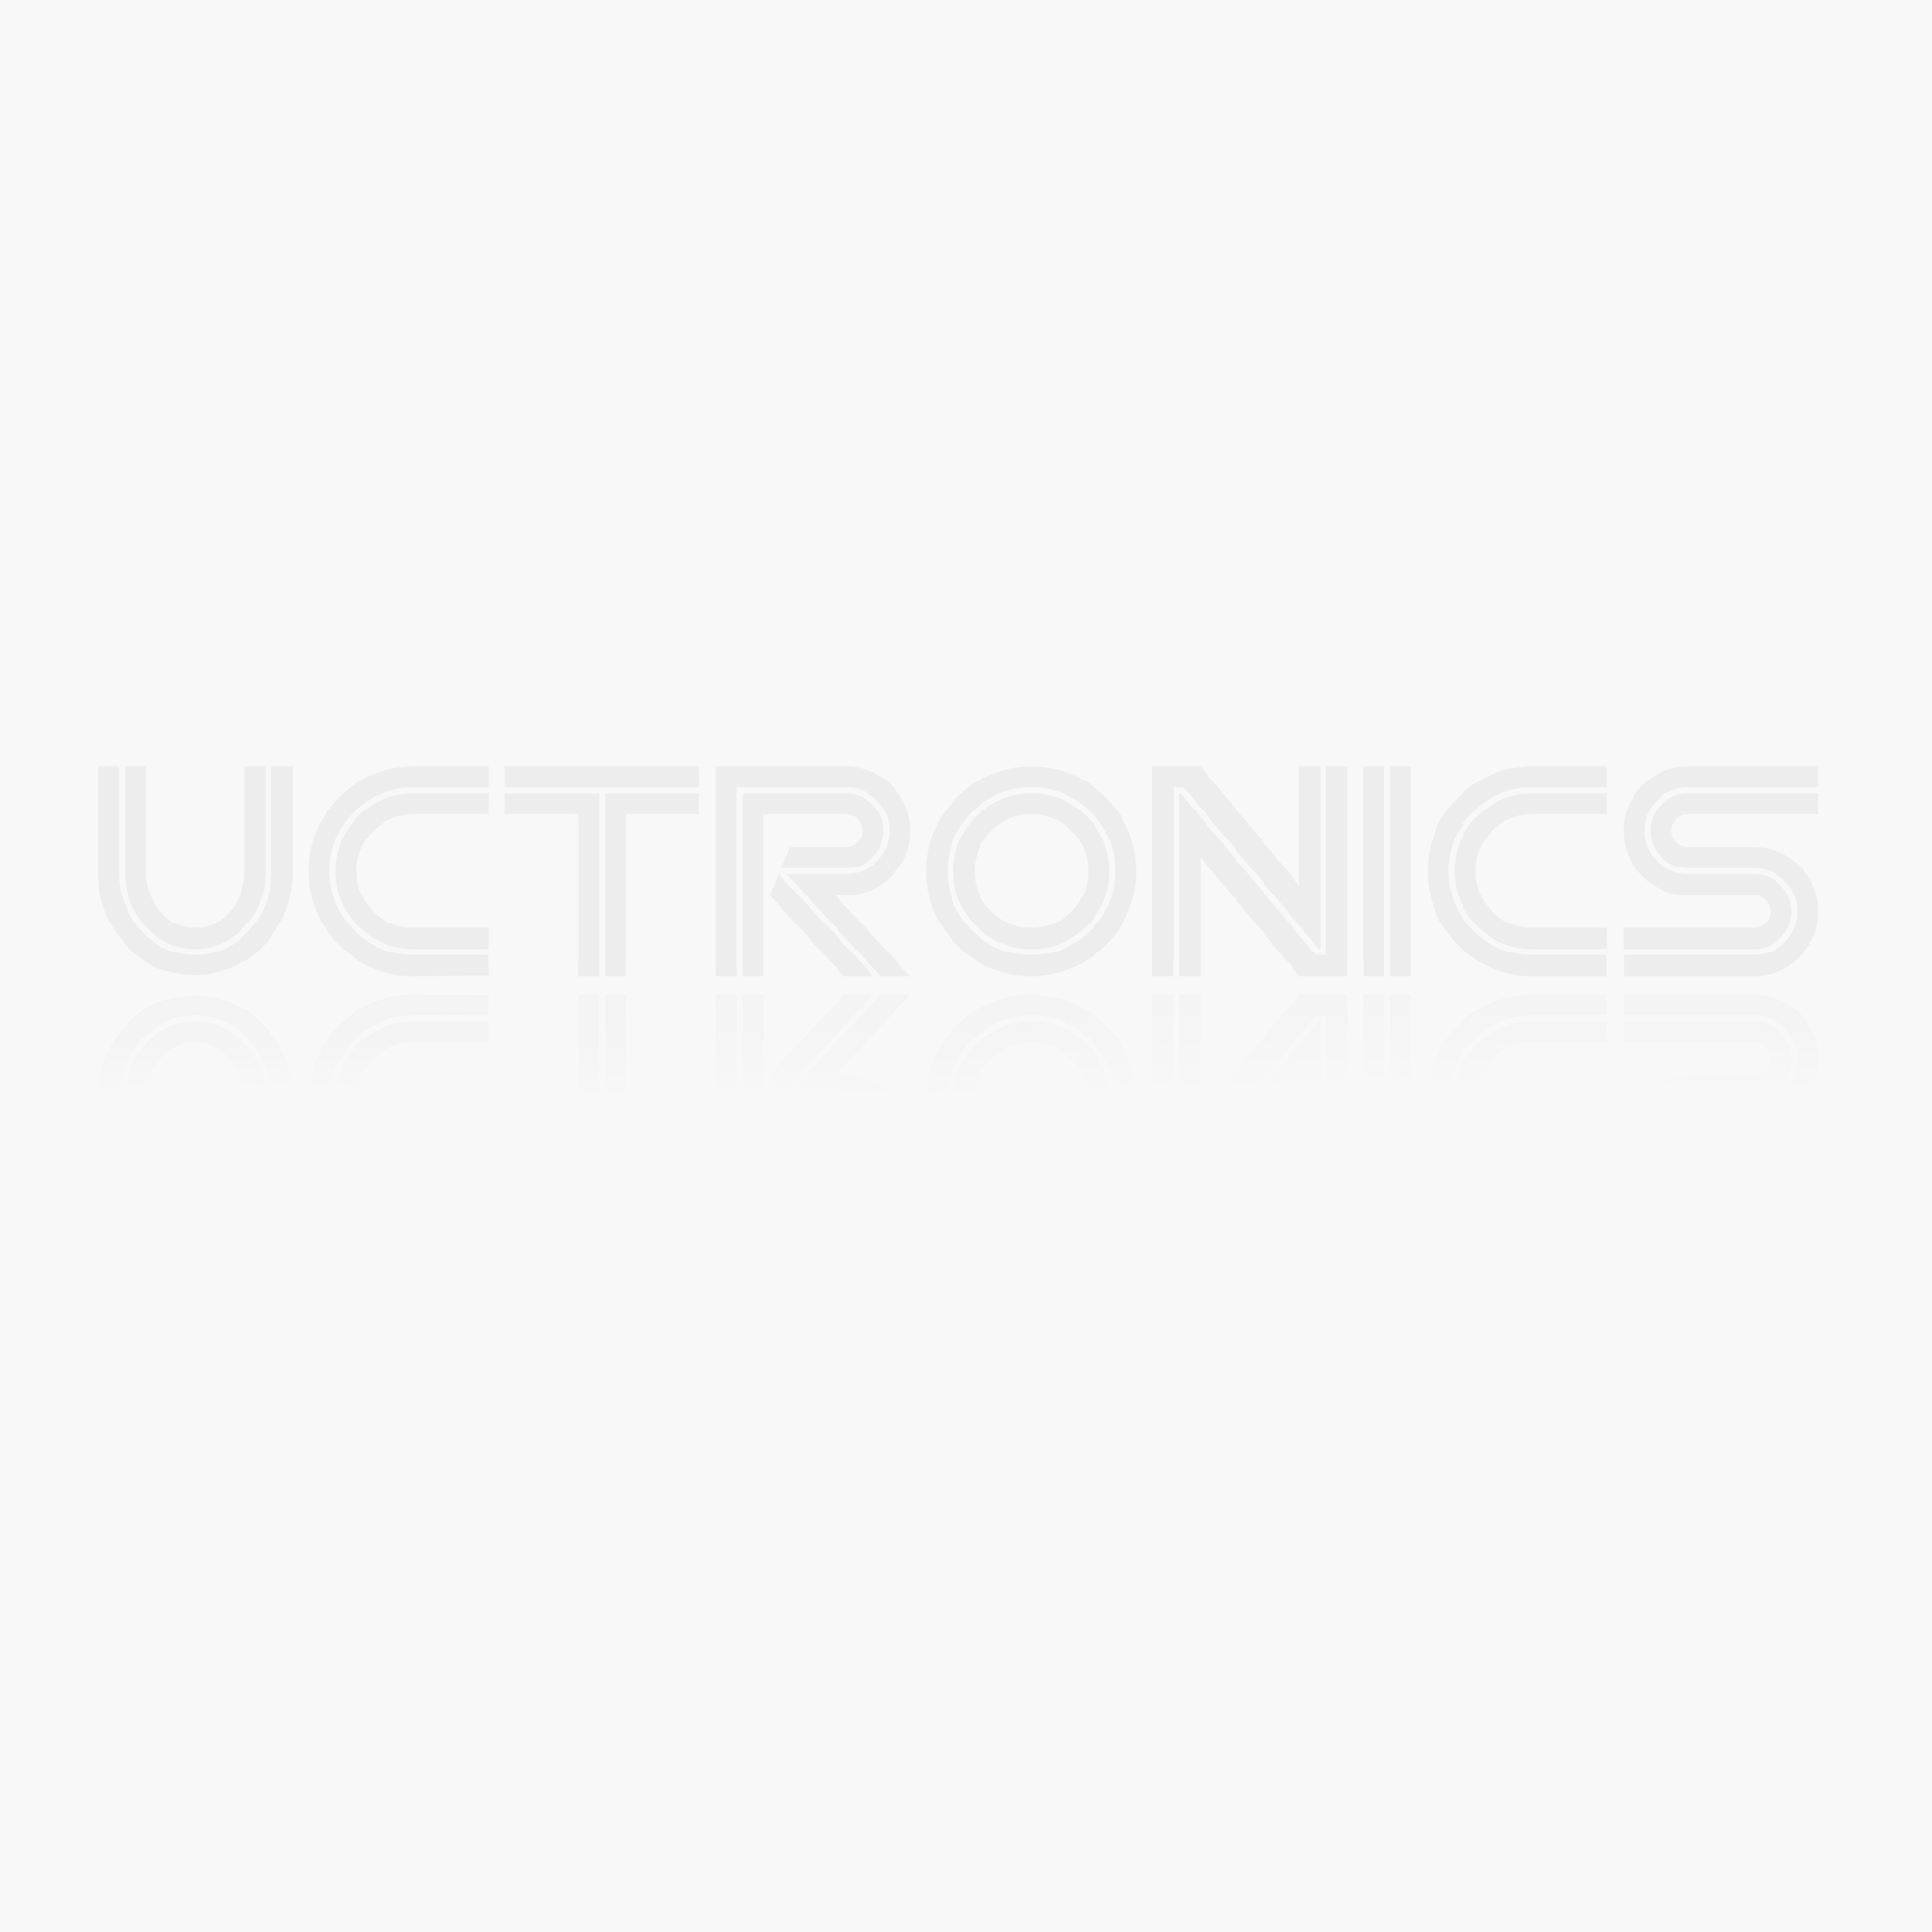 10pcs s49e 49e hall element sensor linear switch for Linear motor hall sensor